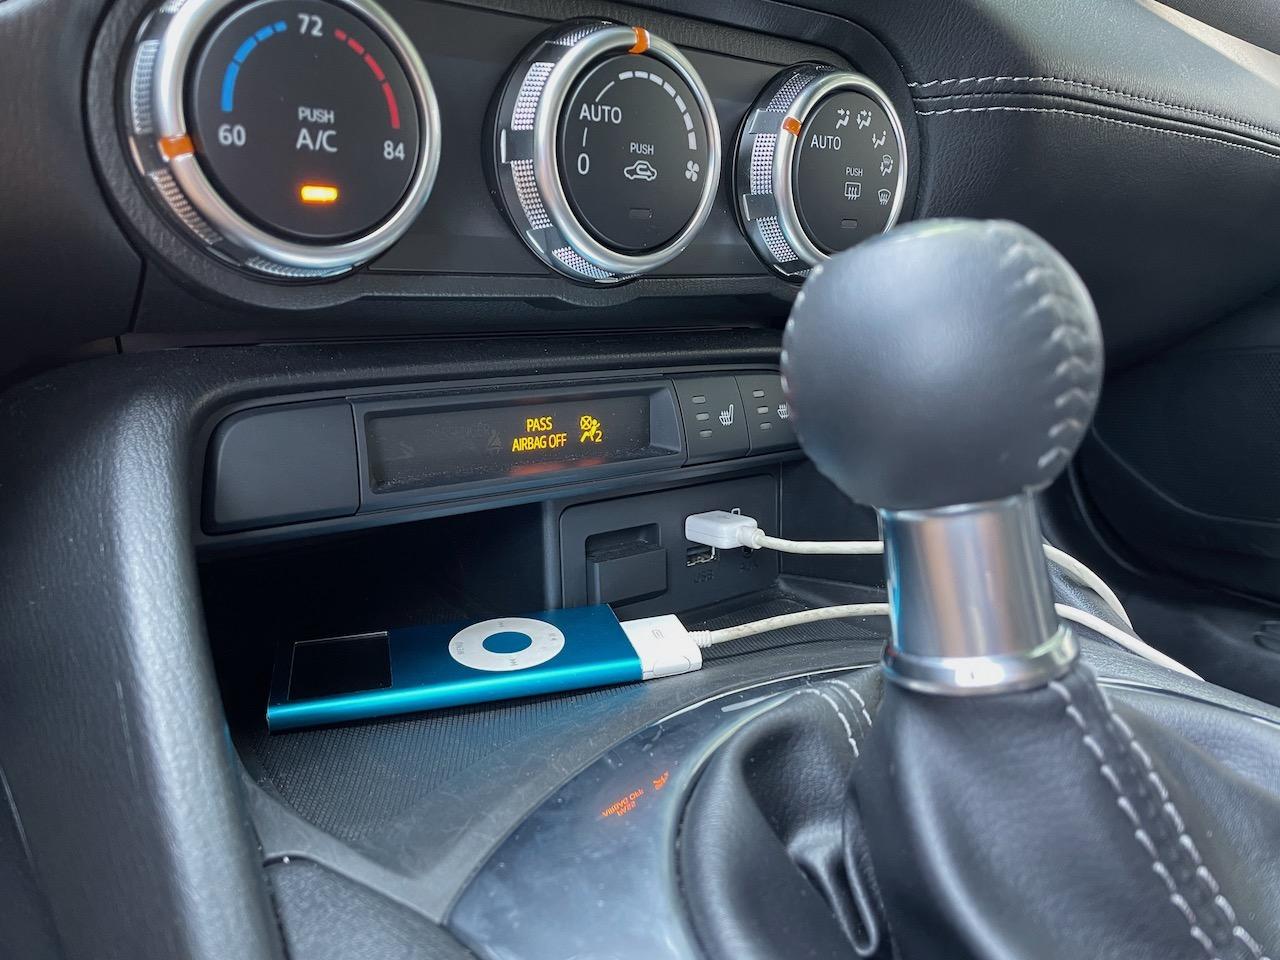 2021 Mazda MX-5 Miata iPod USB